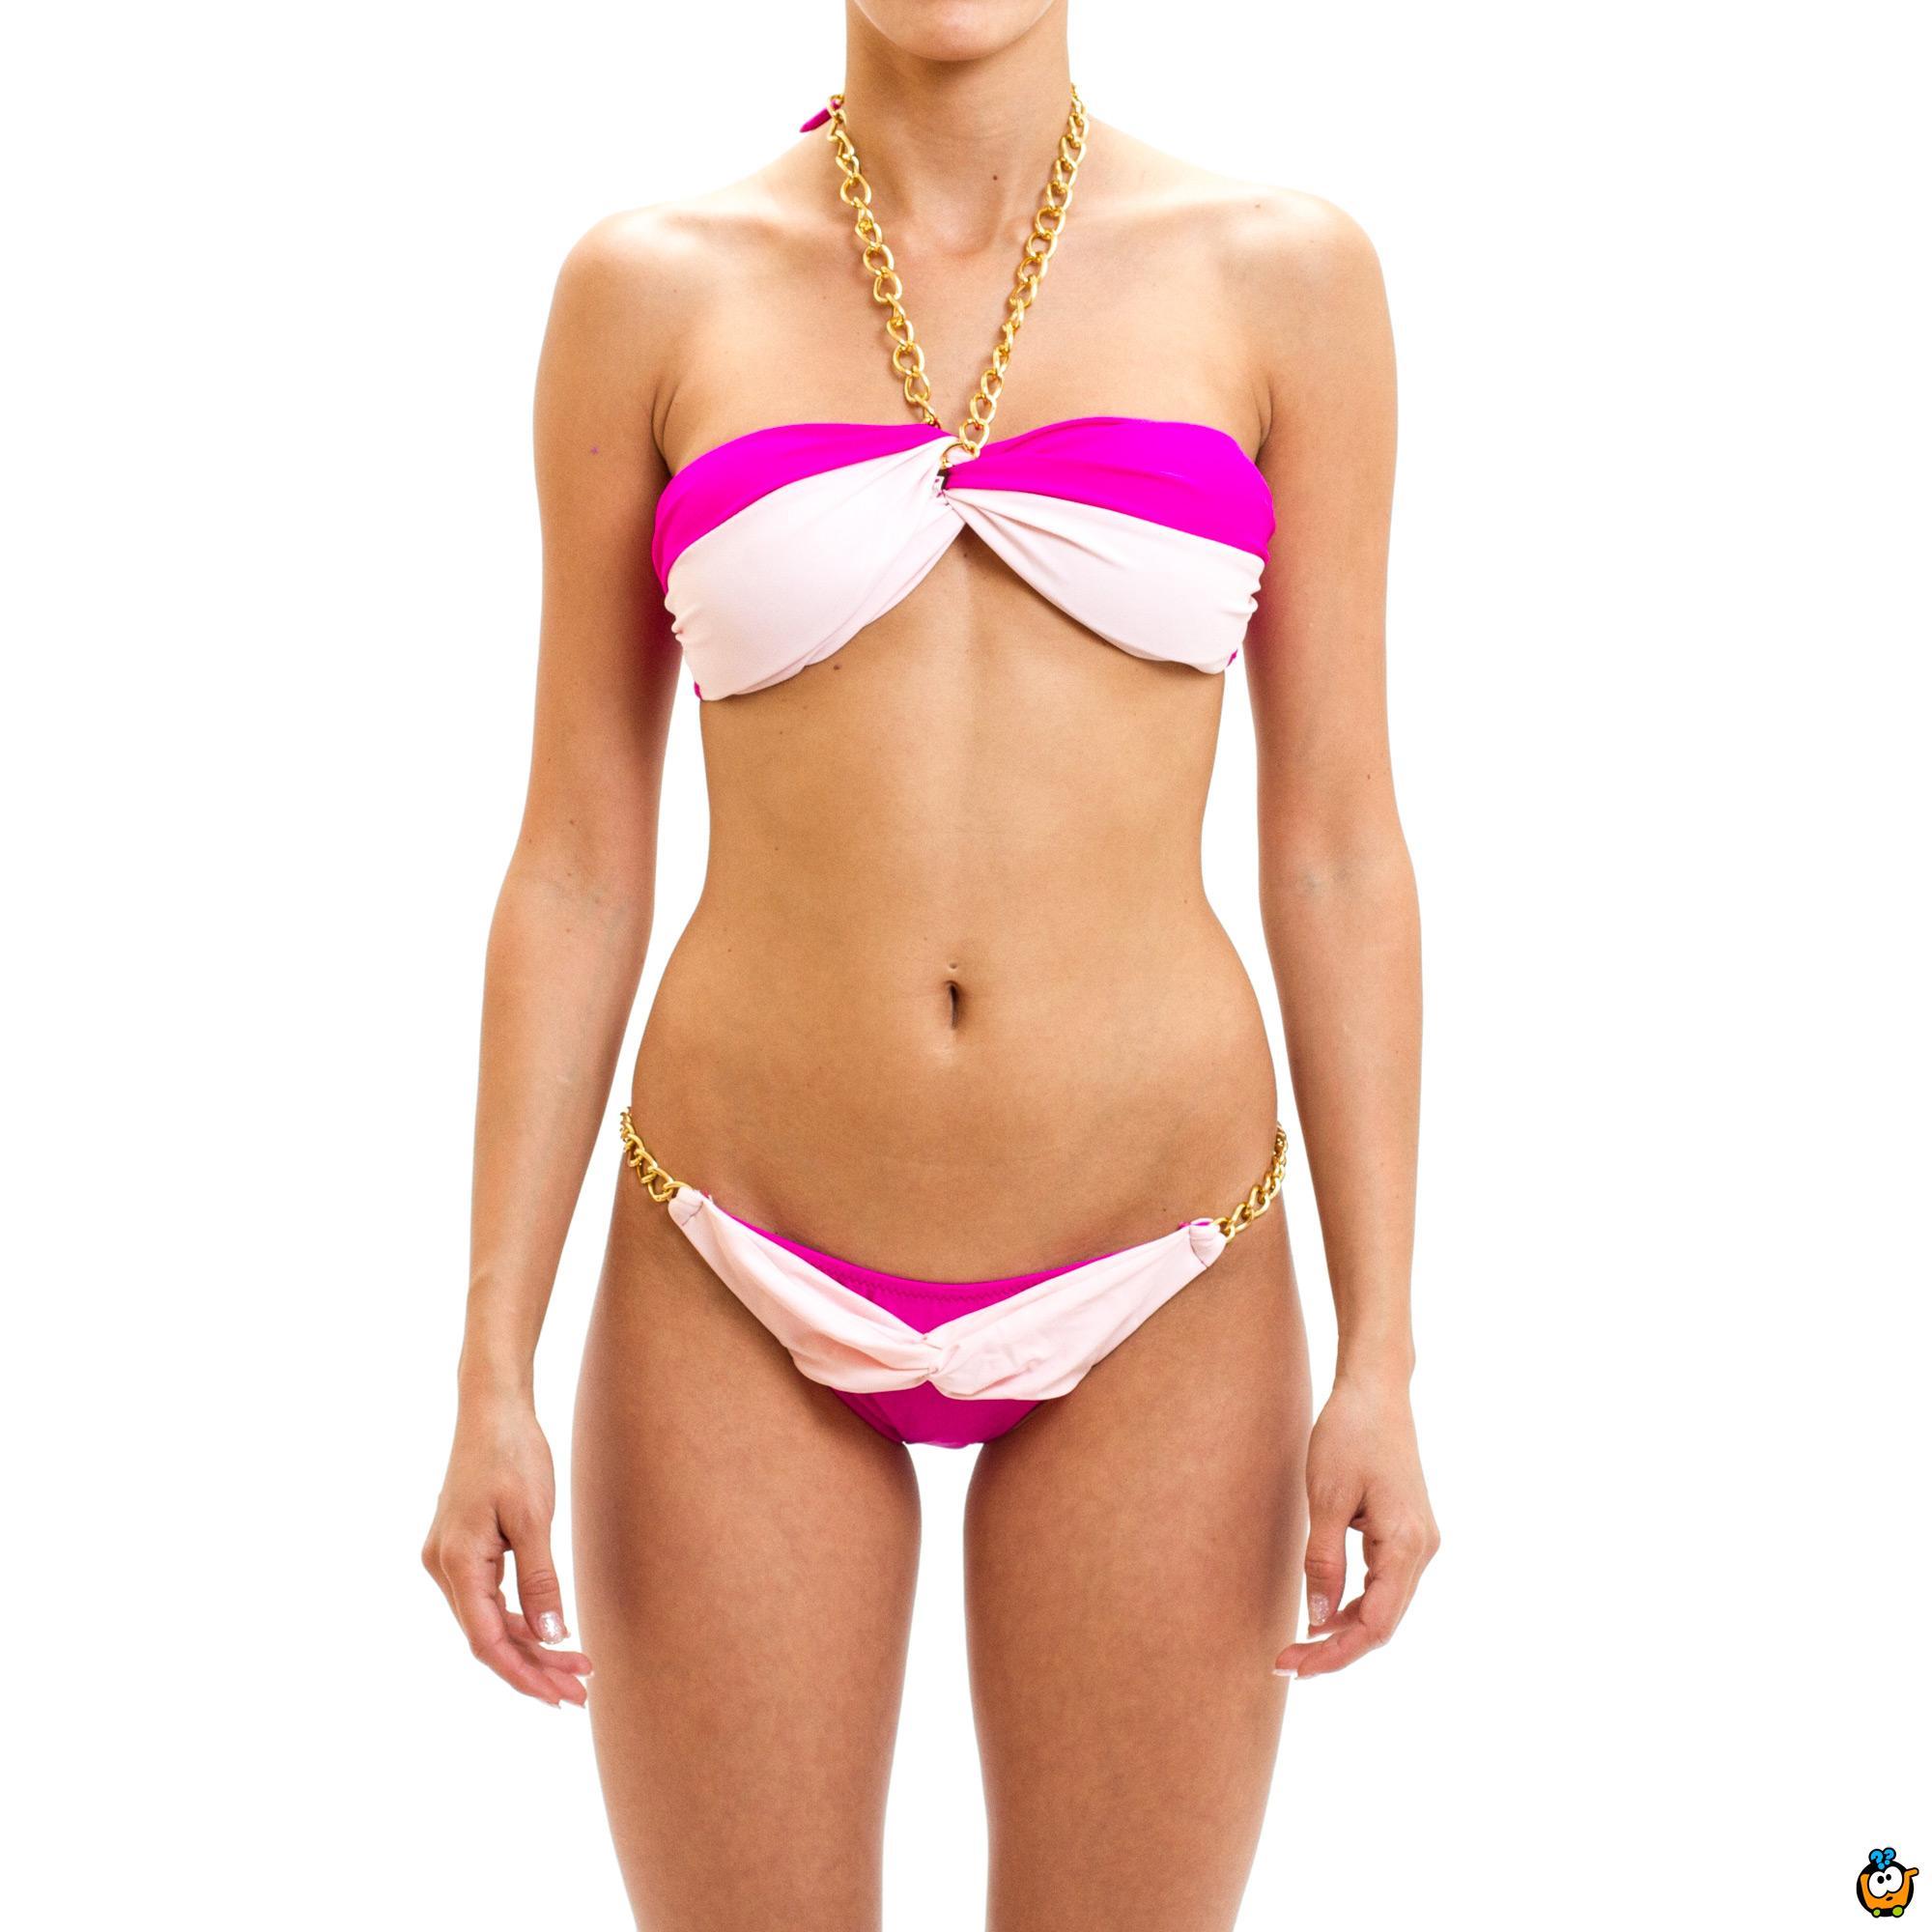 Dvodelni ženski kupaći kostim - ROSE STAR